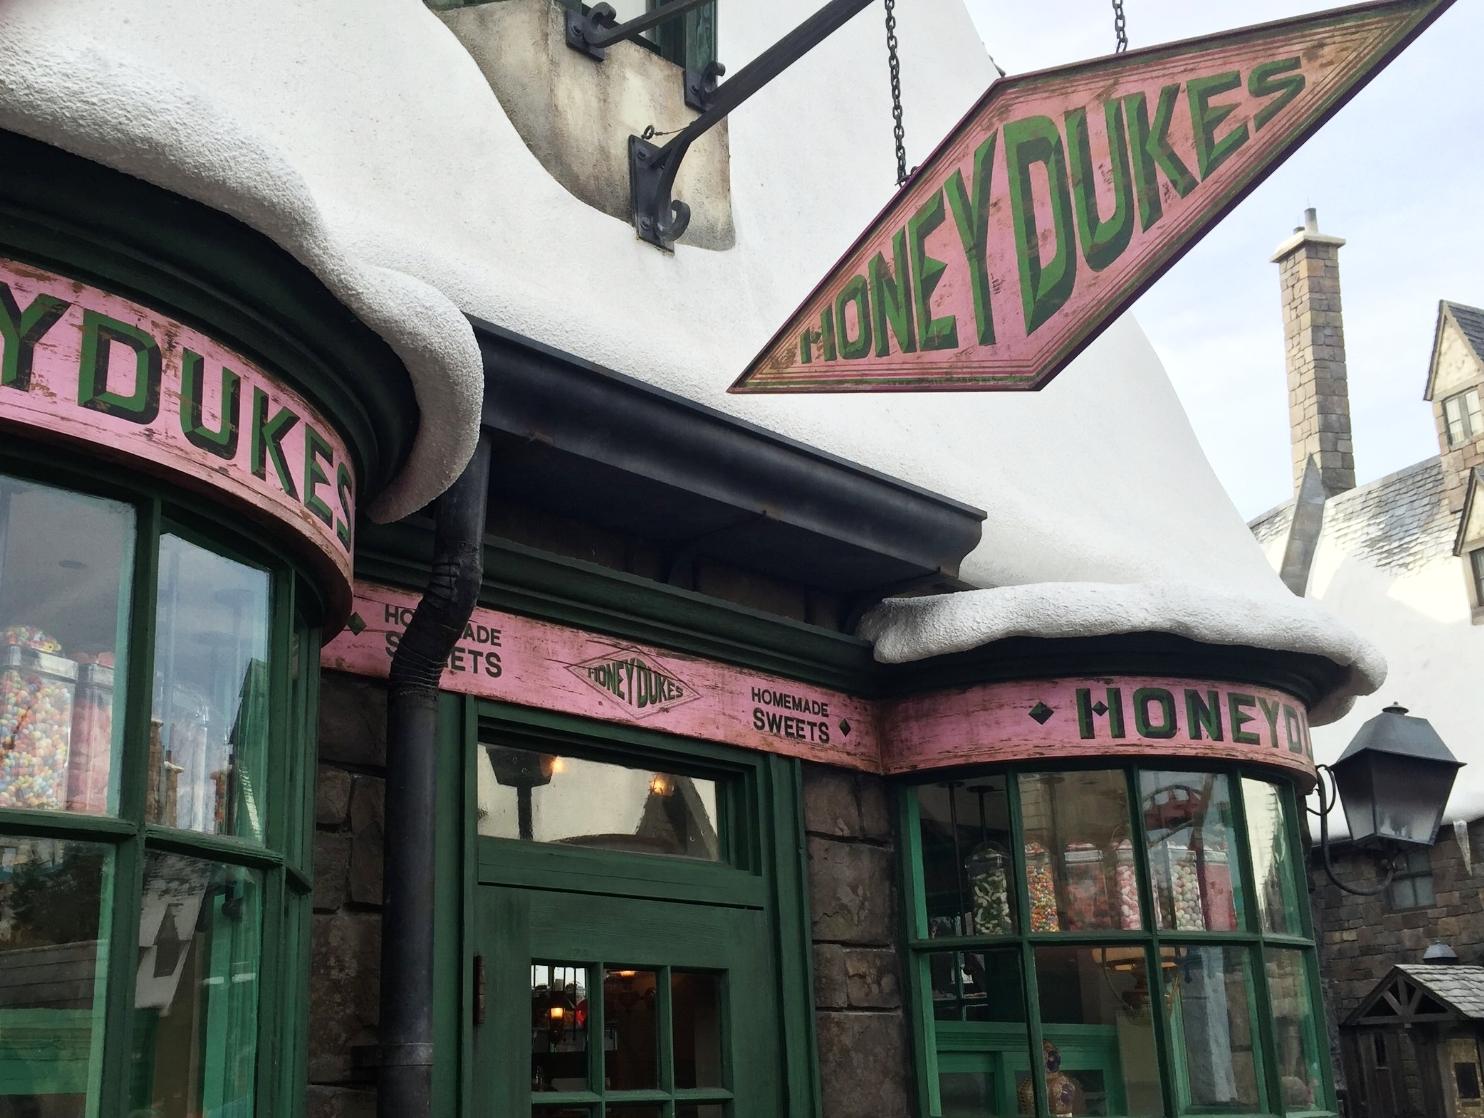 Honeydukes in the Wizarding World of Harry Potter - Hogsmeade